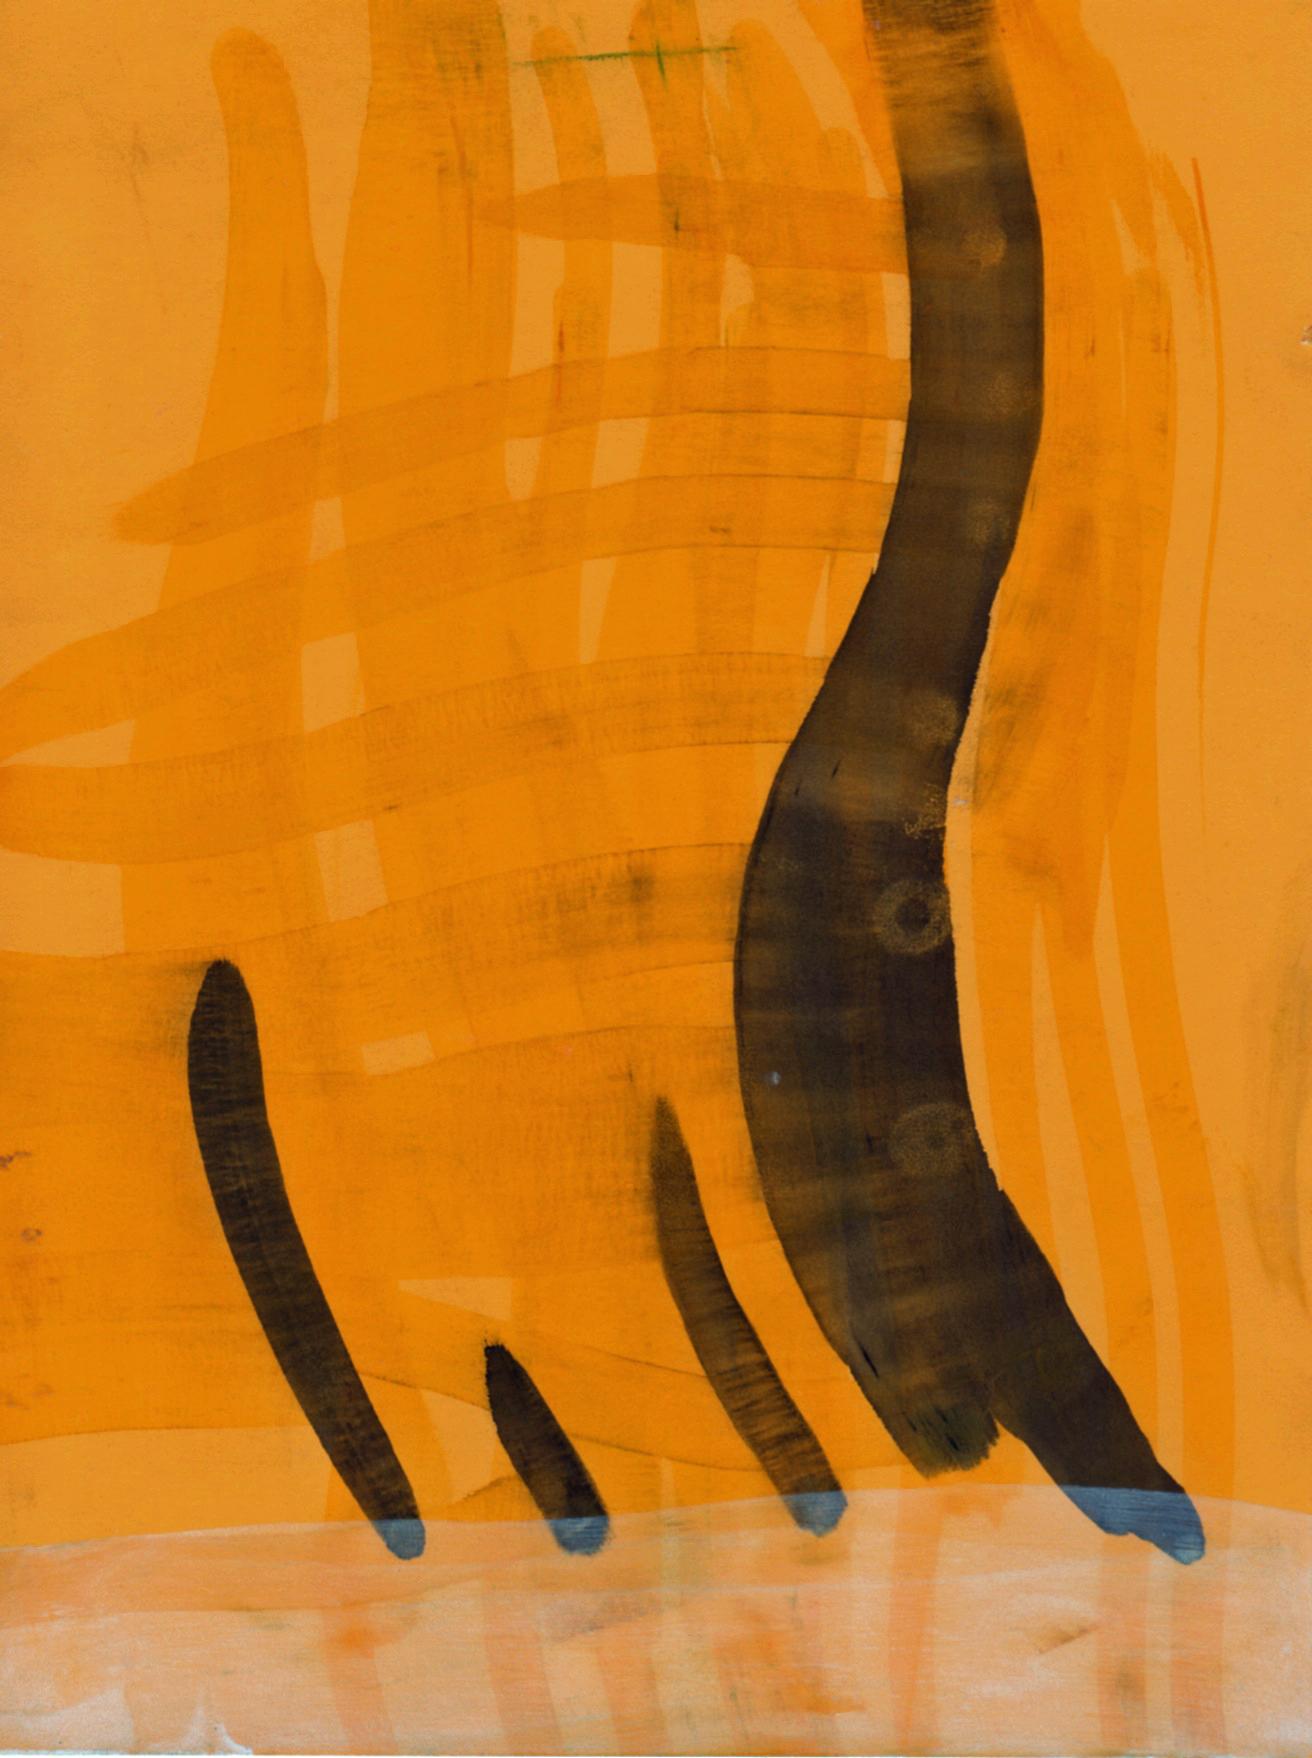 flowchart 7,  2012  ink on paper, 7 x 5 in